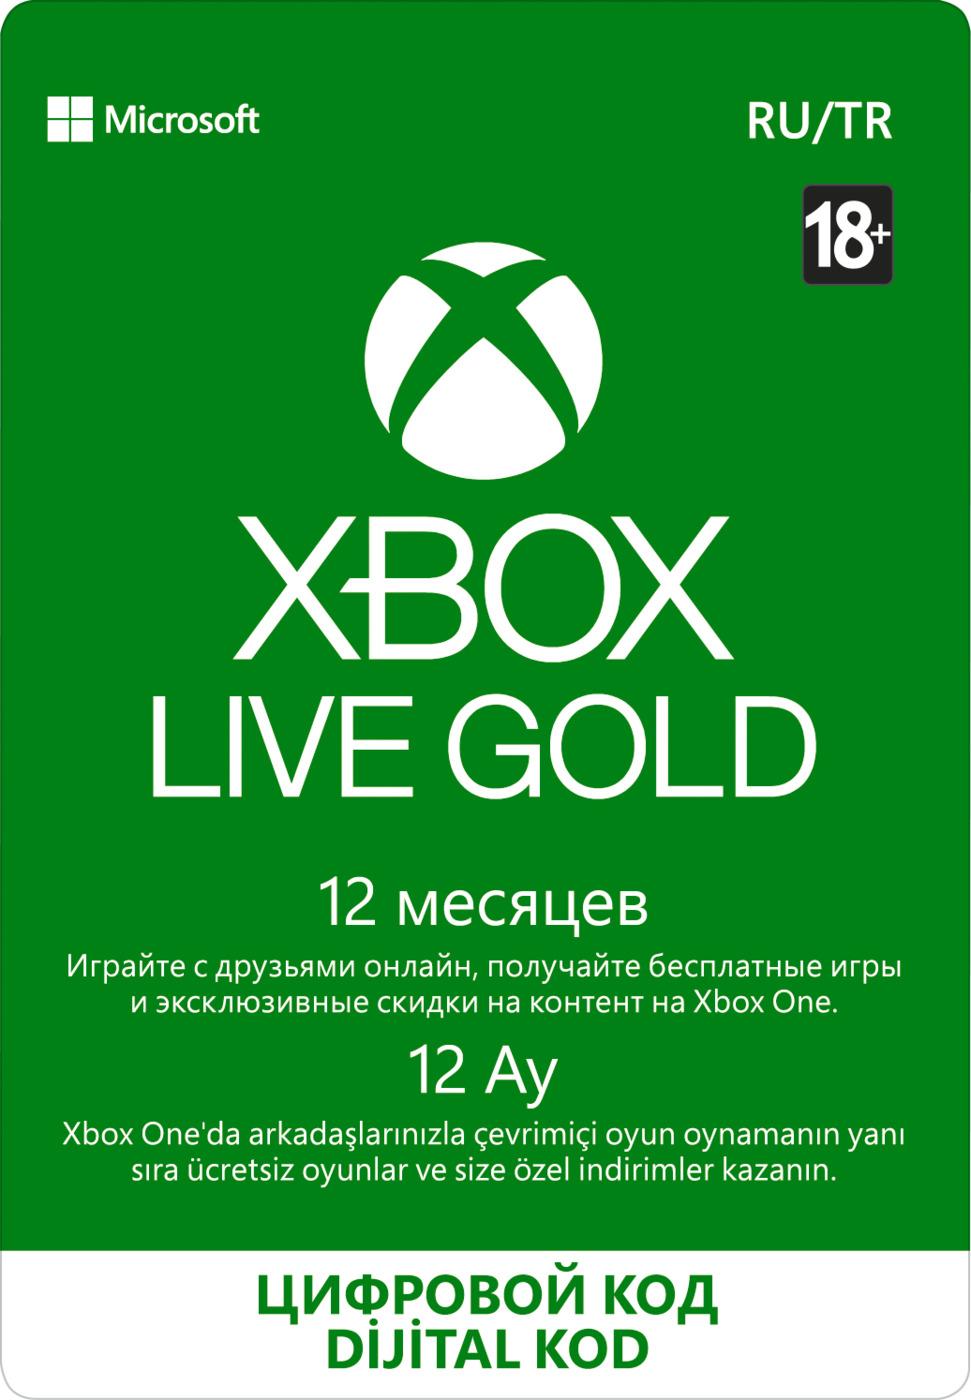 Подписка Xbox LIVE: GOLD на 12 месяцев